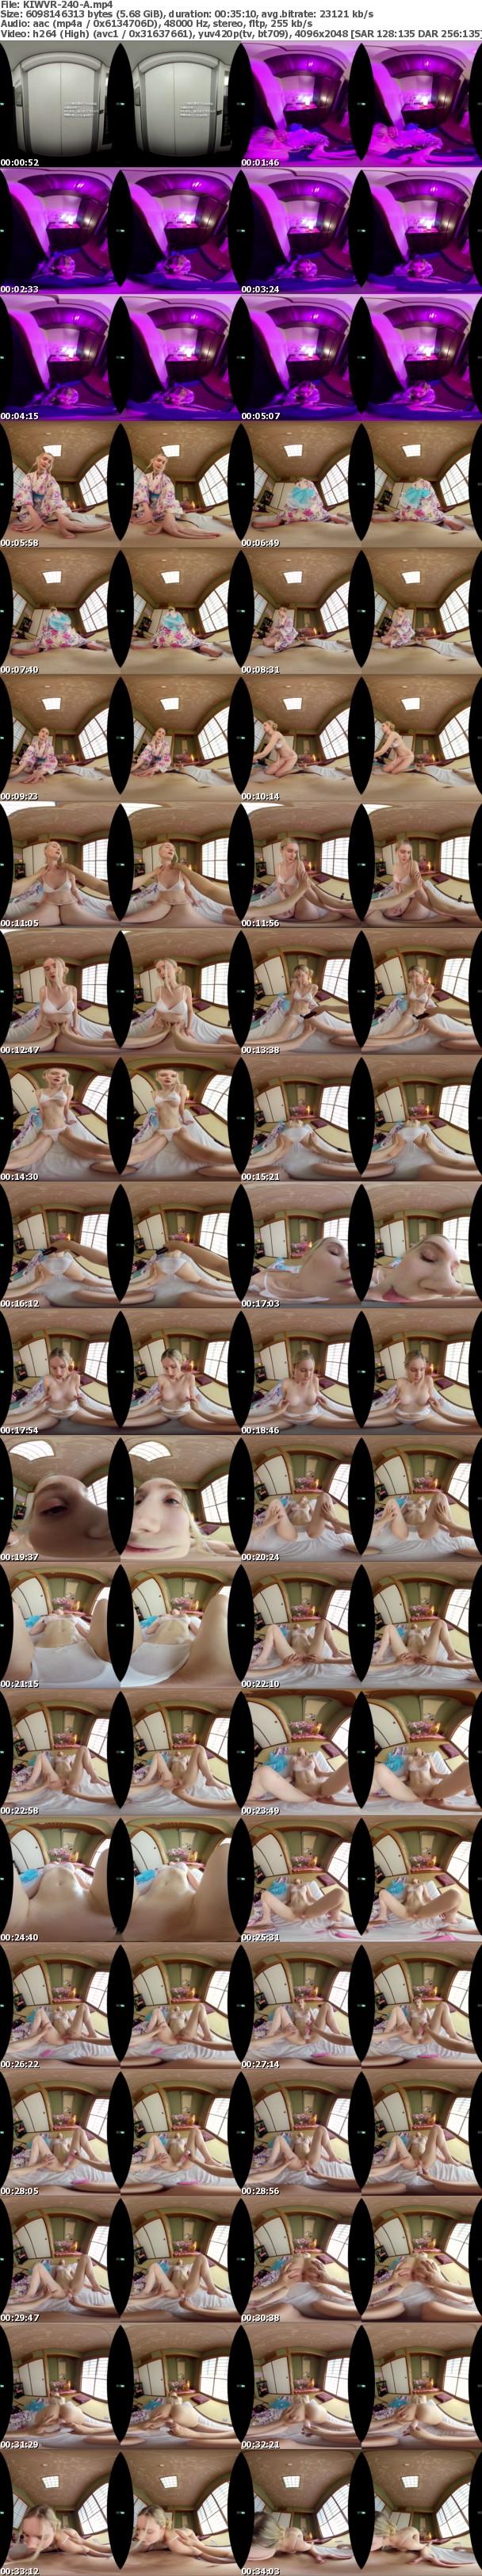 (VR) KIWVR-240 裏風俗で金髪美肌の北欧美人が浴衣姿で媚薬服用おもてなし【即尺ごっくん】からの【生中出し・顔射】金玉袋が枯れるまで極上キメパコSEX リリー・ハート